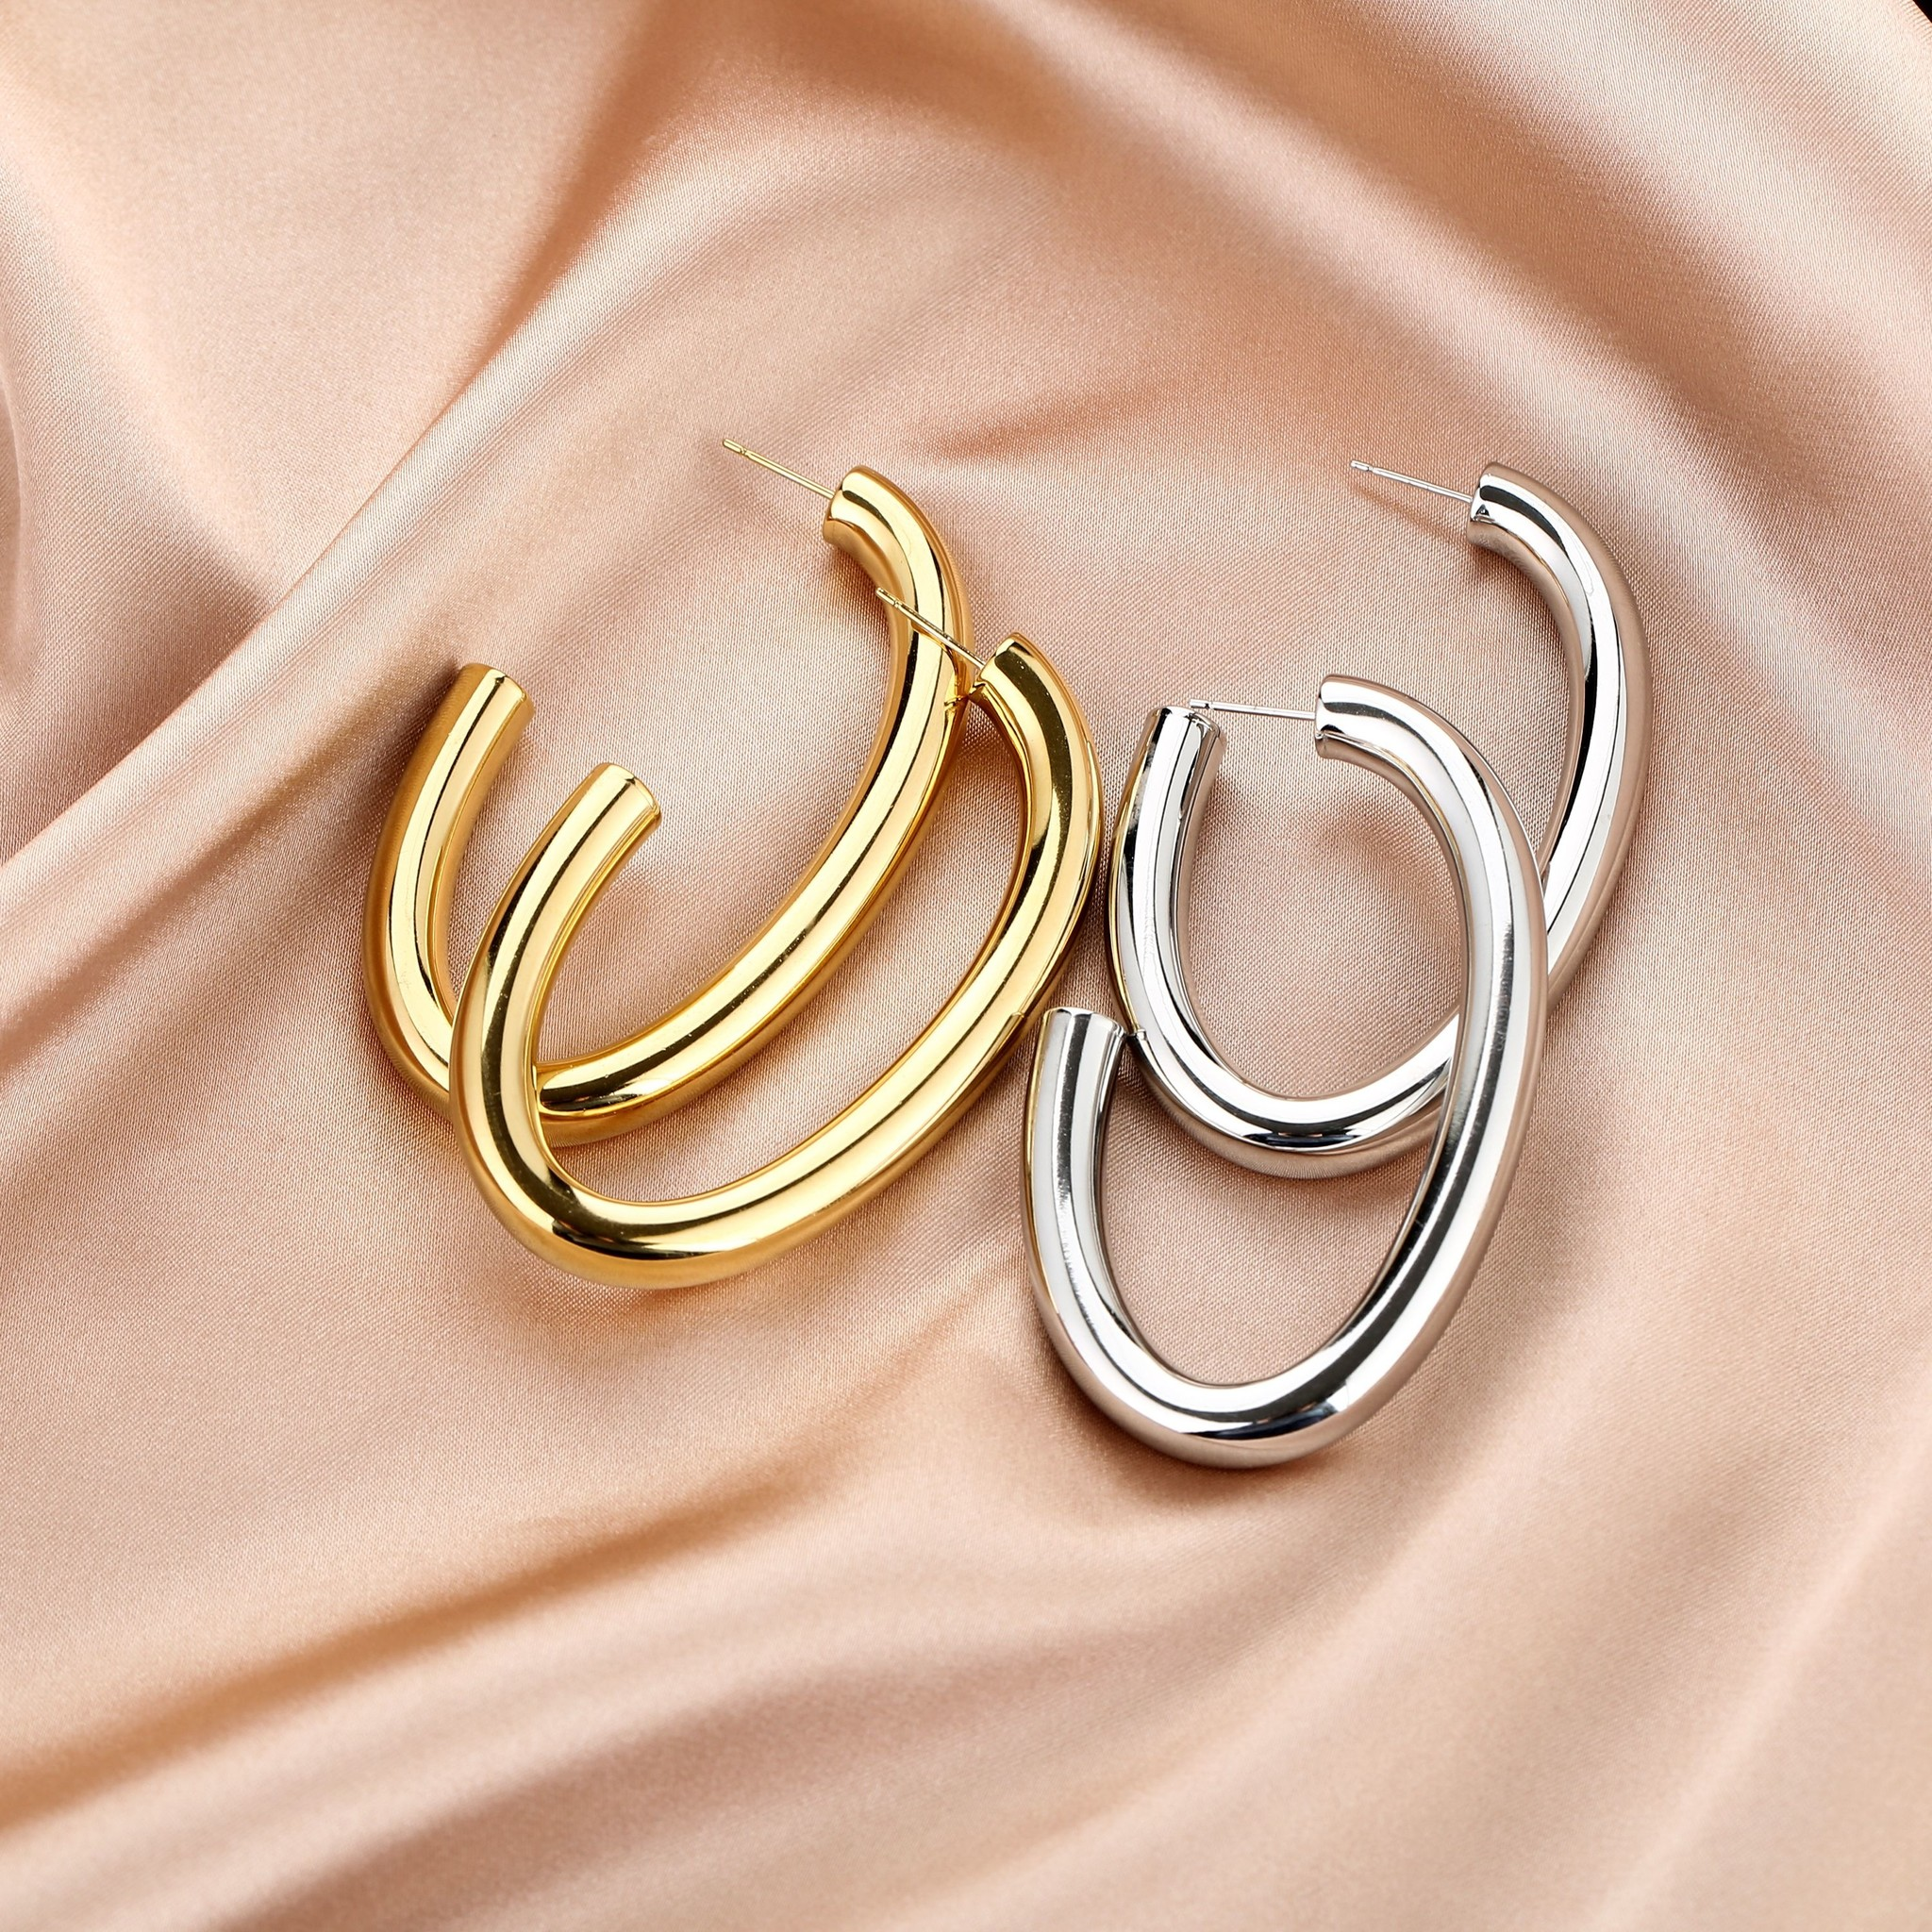 Stainless Steel Statement Earrings